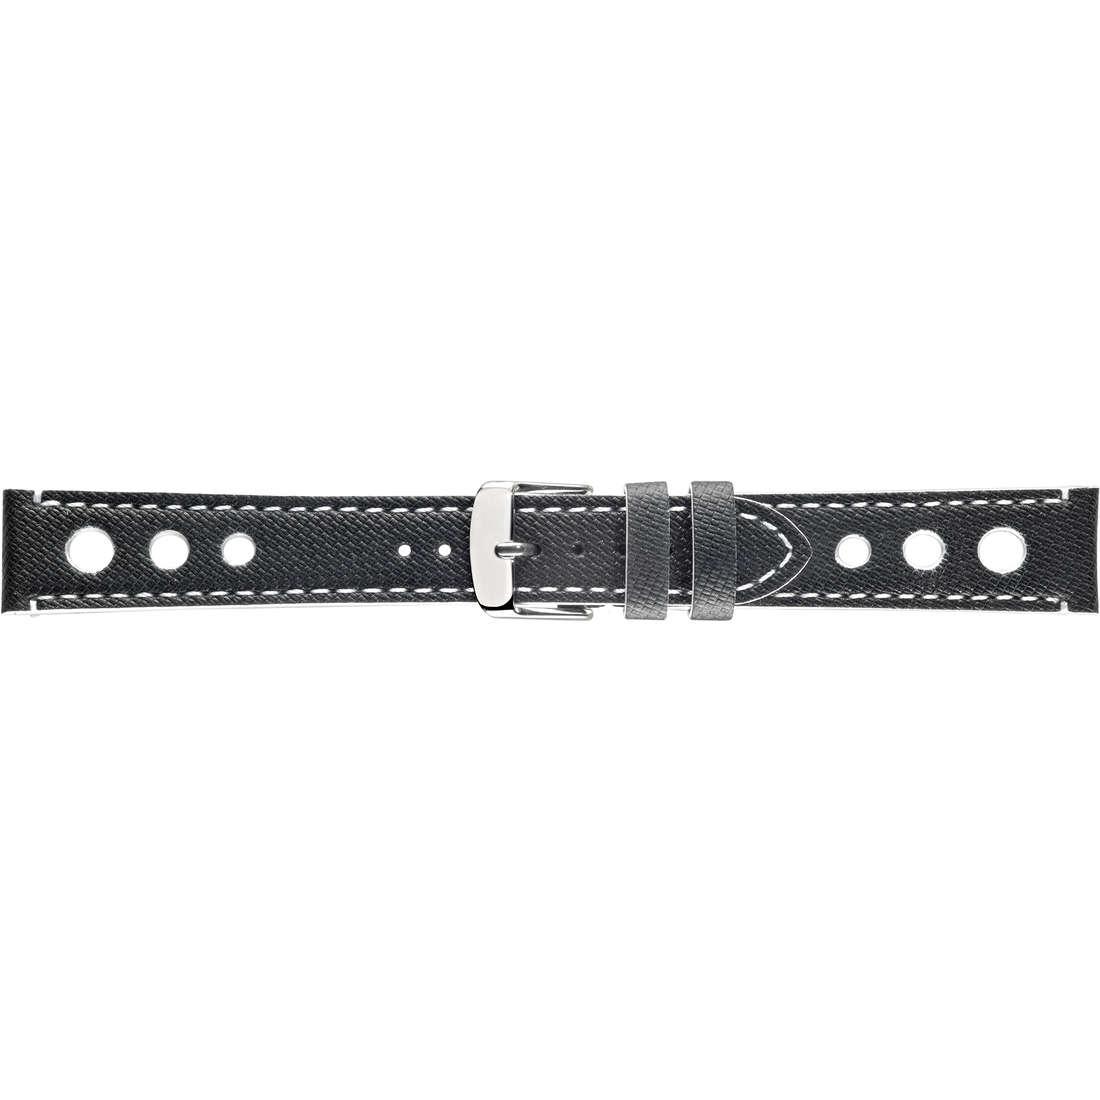 watch watch bands watch straps man Morellato Linea Sport A01X4498B24817CR20